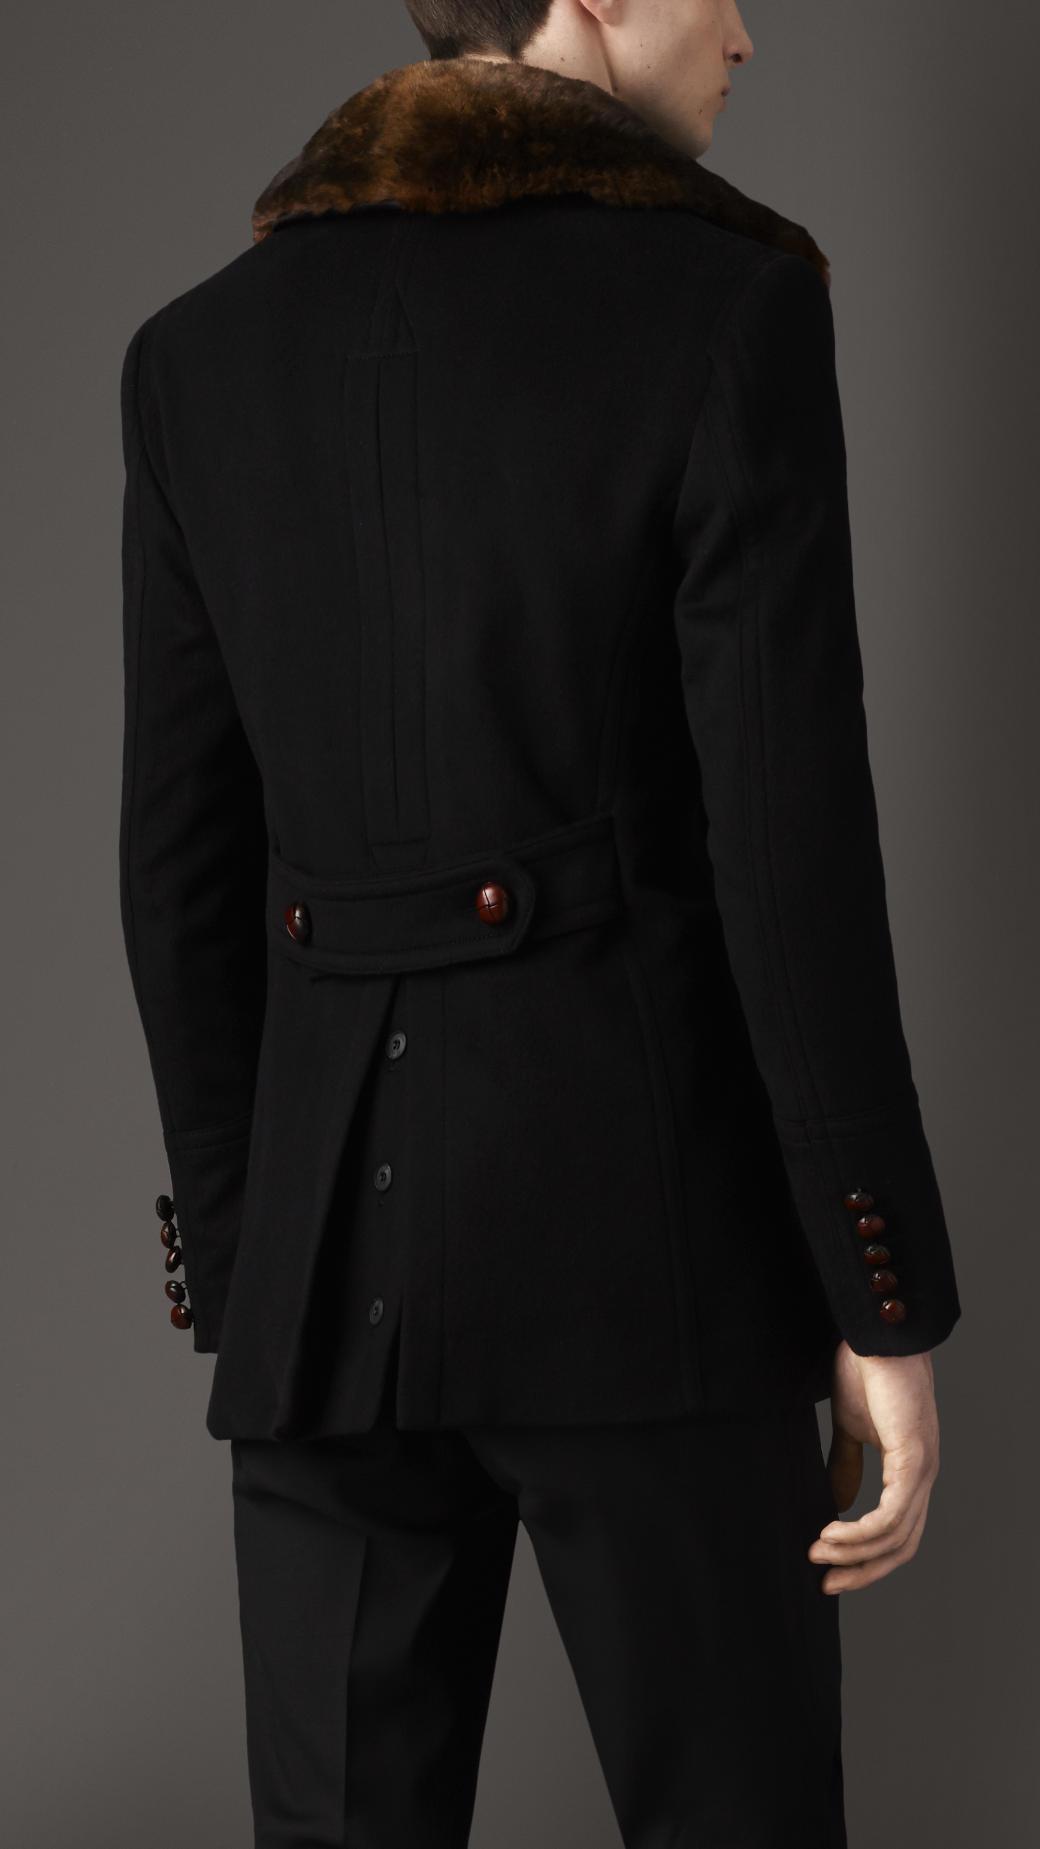 87ca281430a9 Best Lyst - Burberry Fur Collar Pea Coat in Black for Men TS36